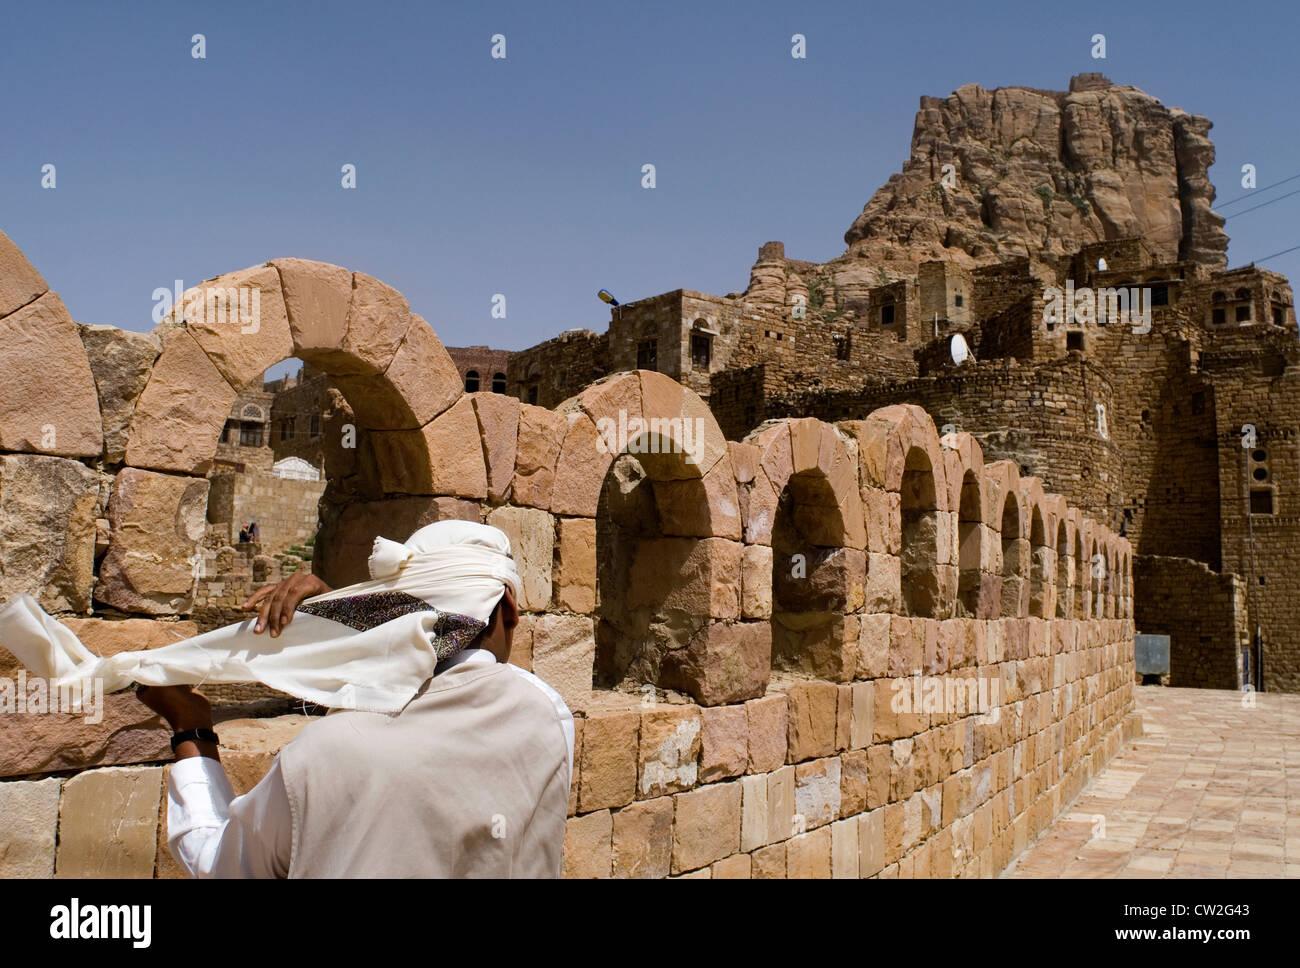 Old village of Thula, the Highlands region, Yemen, Western Asia, Arabian Peninsula. - Stock Image